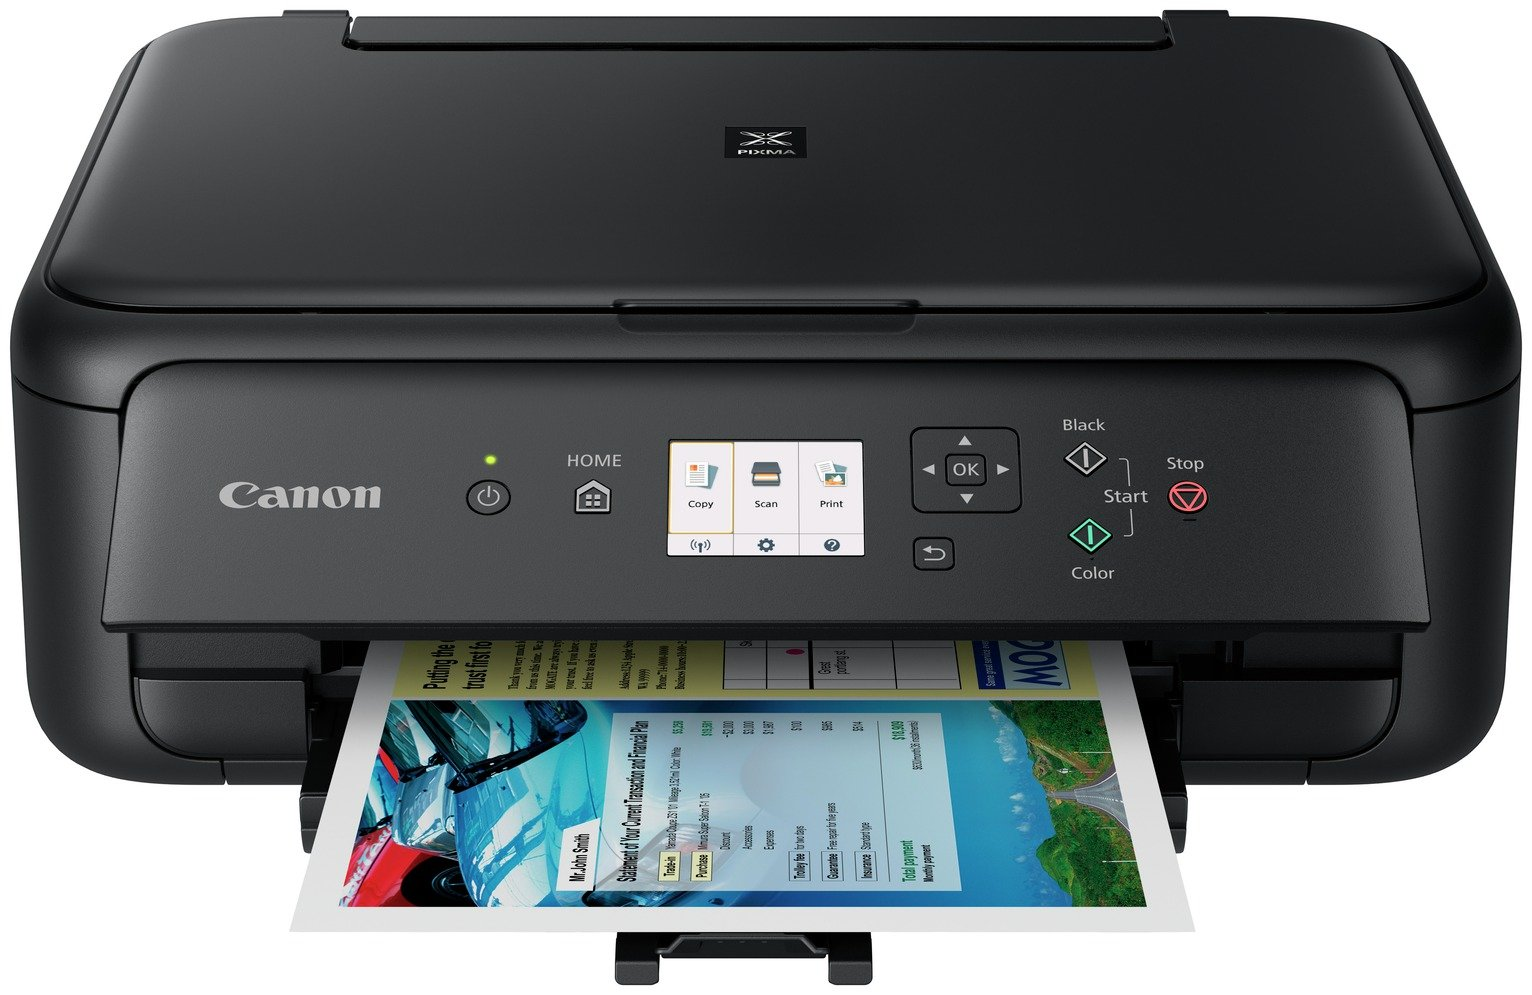 Canon PIXMA MG5320 Printer XPS Drivers Update